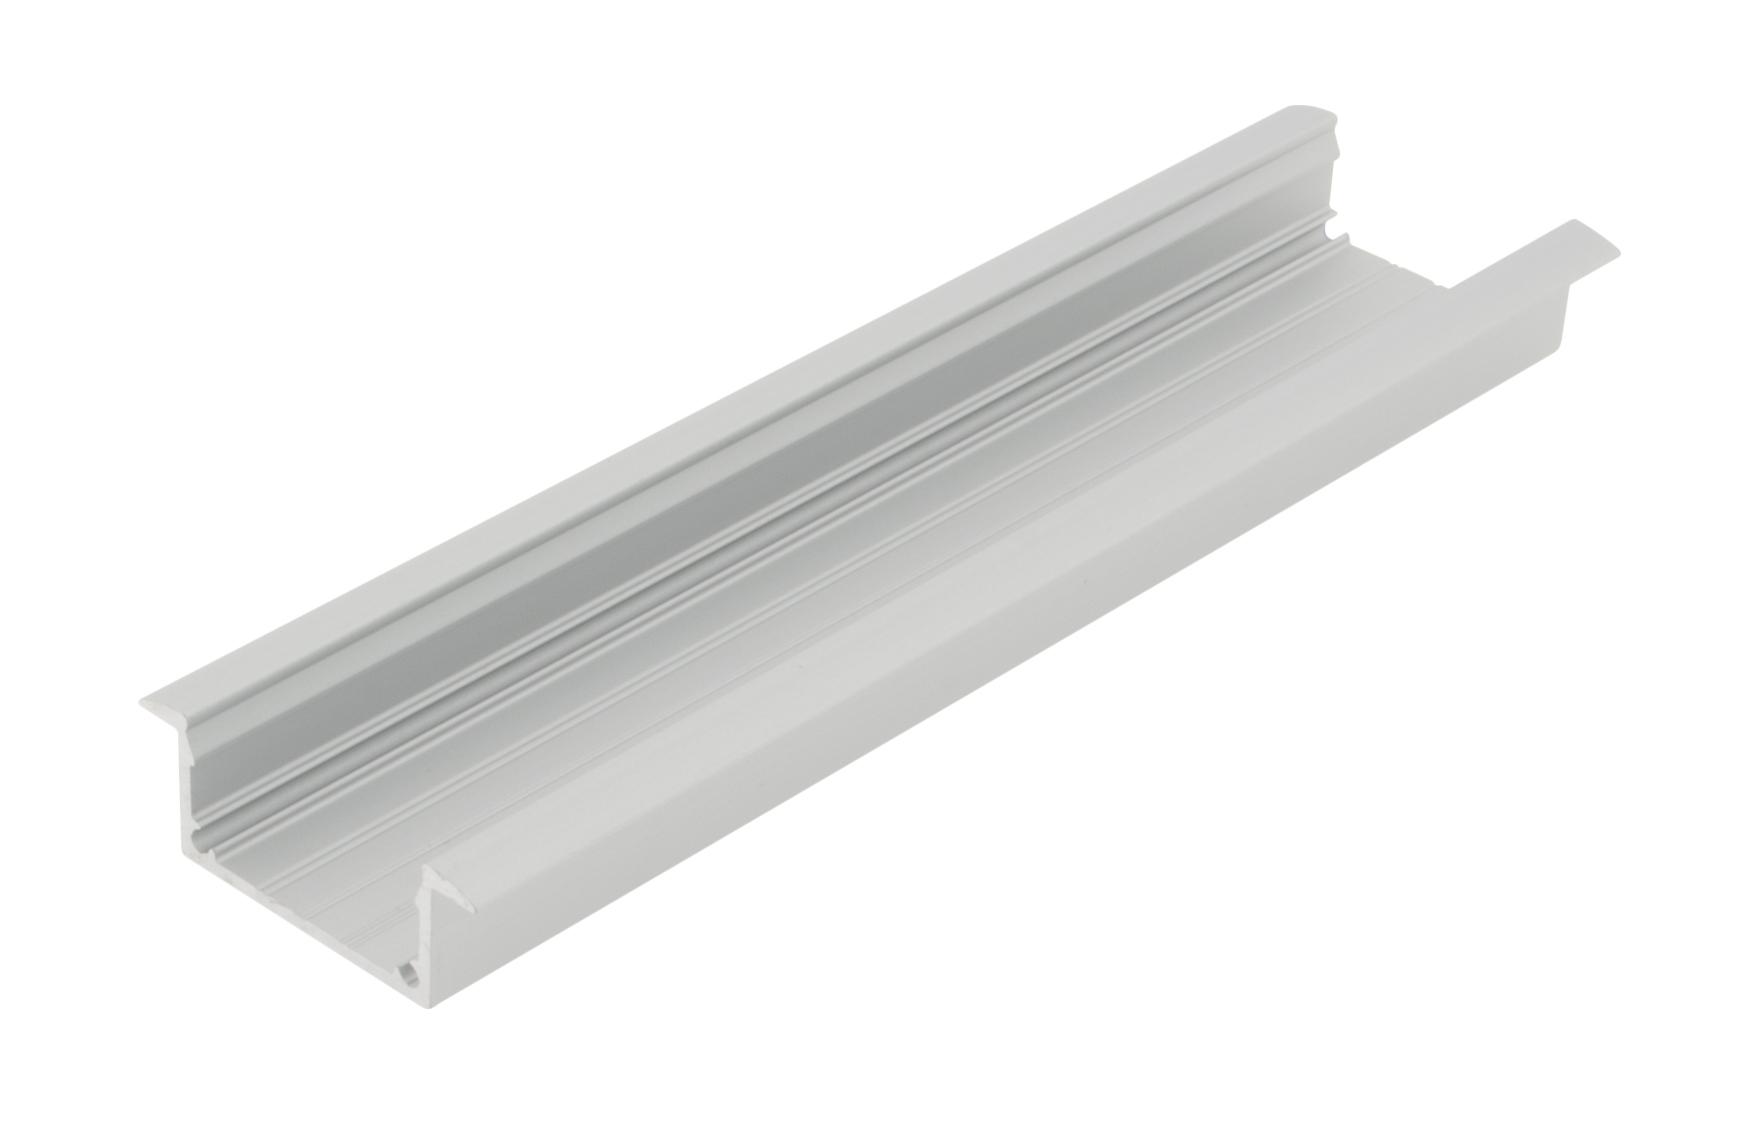 1 m Aluminium Profil LBKI (Klipsprofil Einbau) LIAP001206